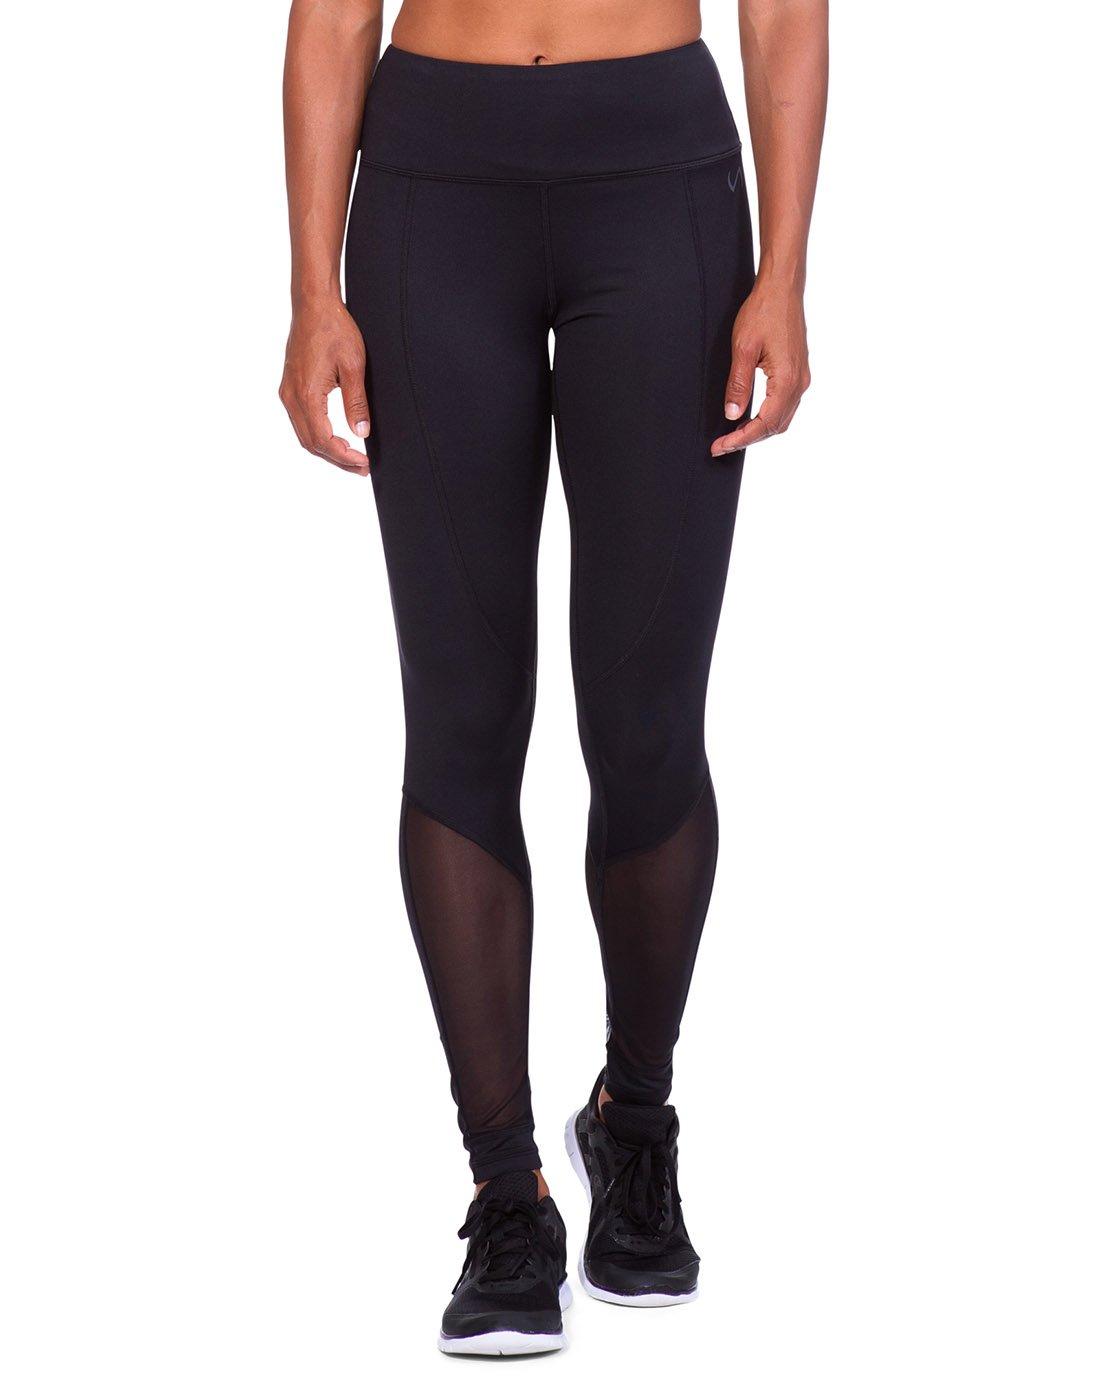 Black TLF Apparel Women's Ryder Leggings